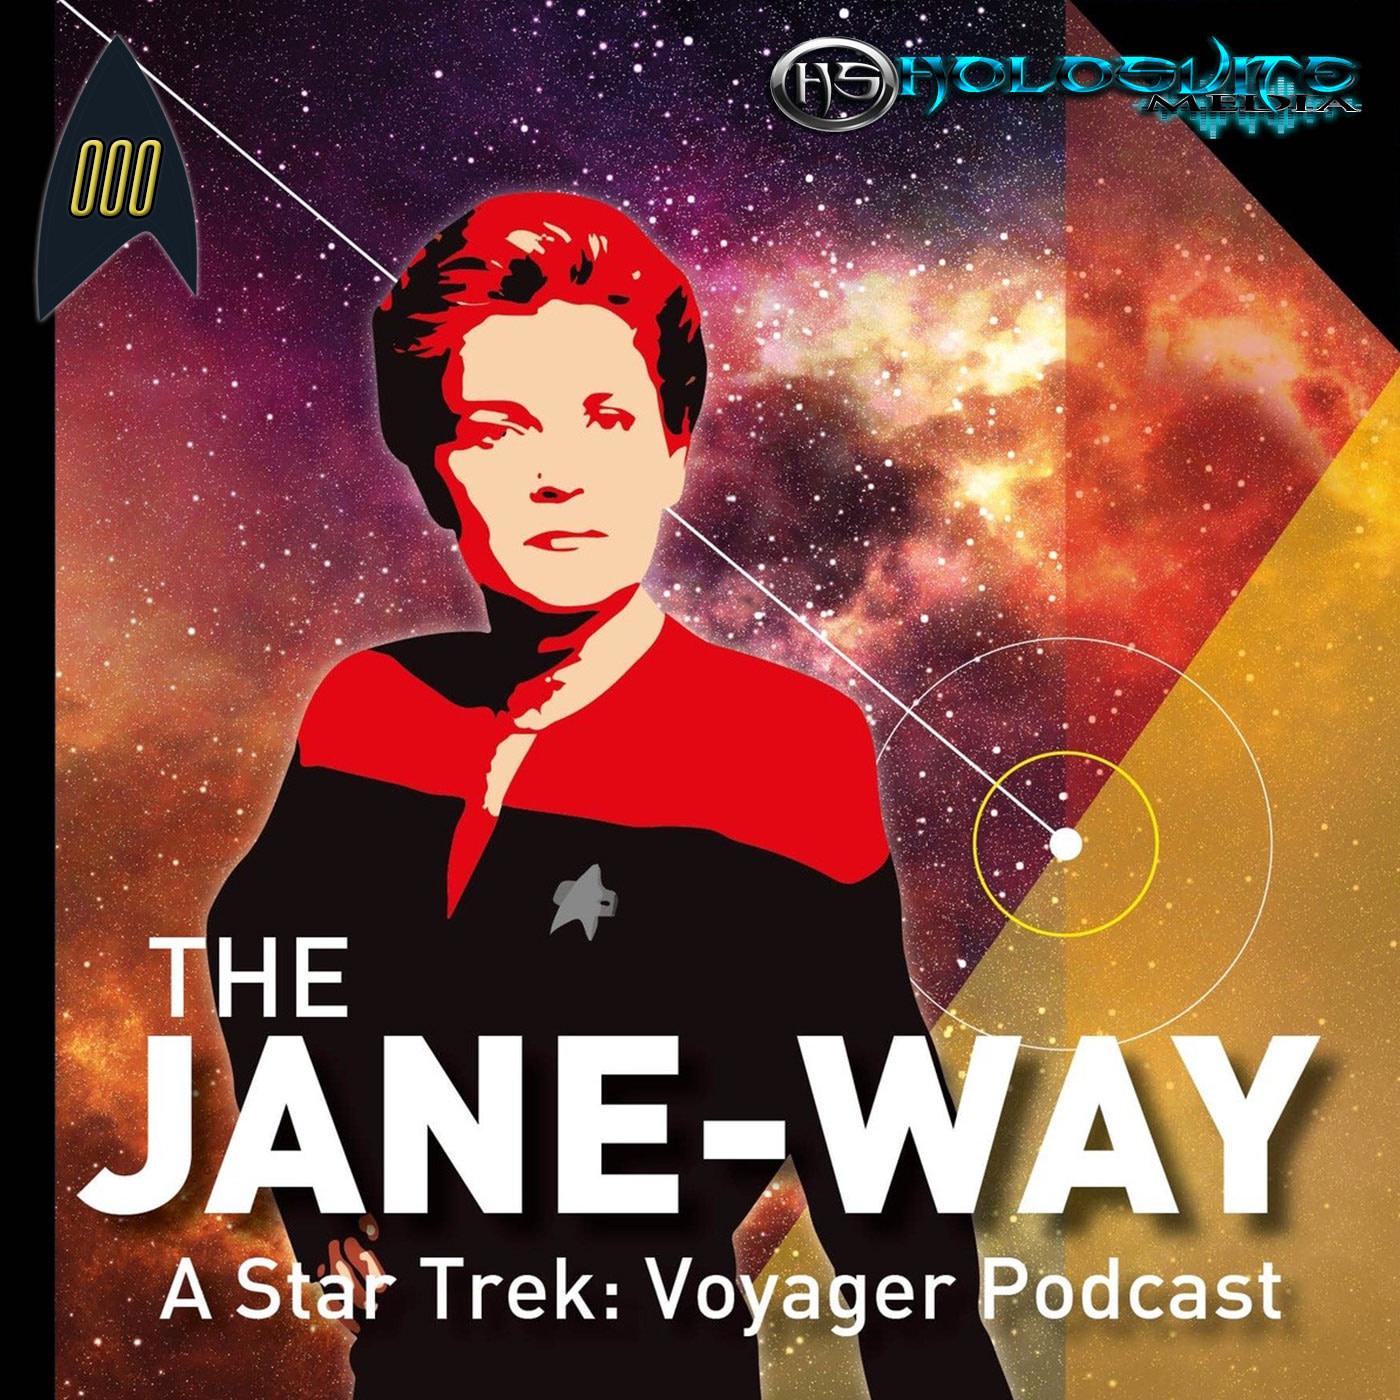 The Jane-Way Episode 0